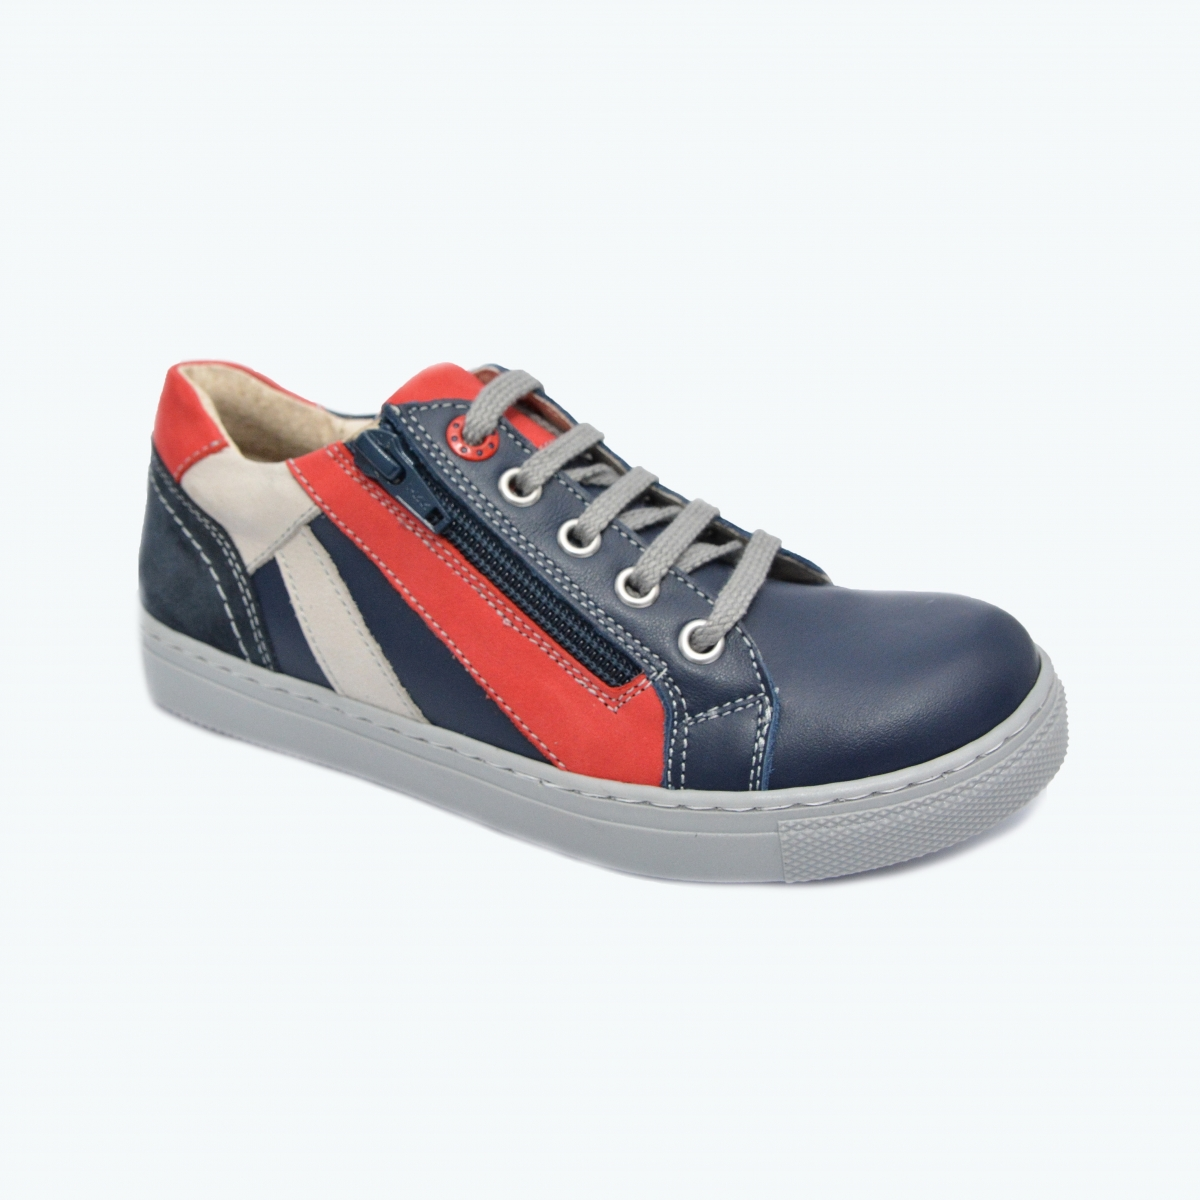 Pantofi sport copii din piele hokide 400 blu rosu bej 26-37